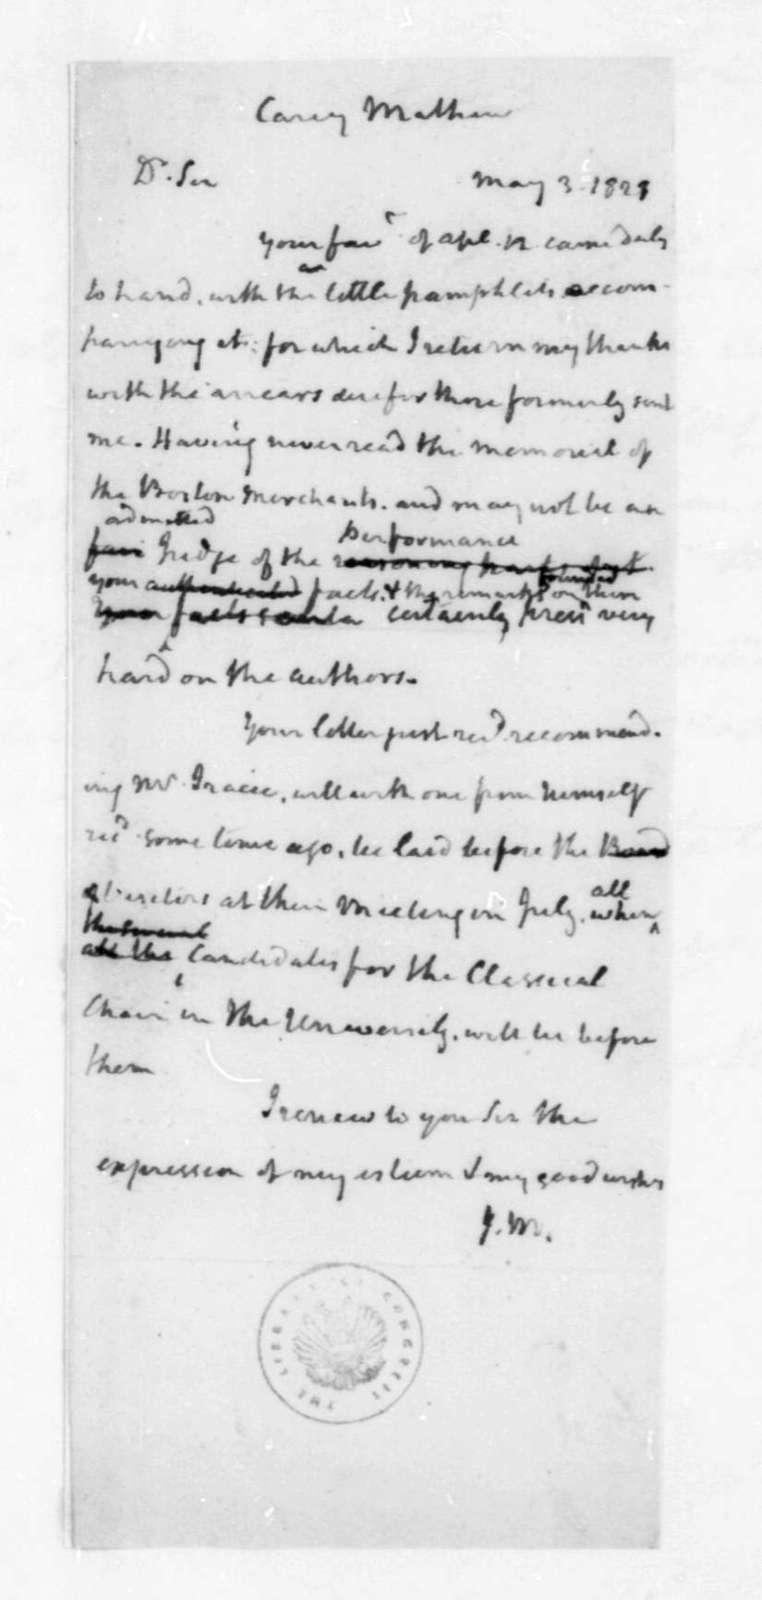 James Madison to Mathew Carey, May 3, 1821.